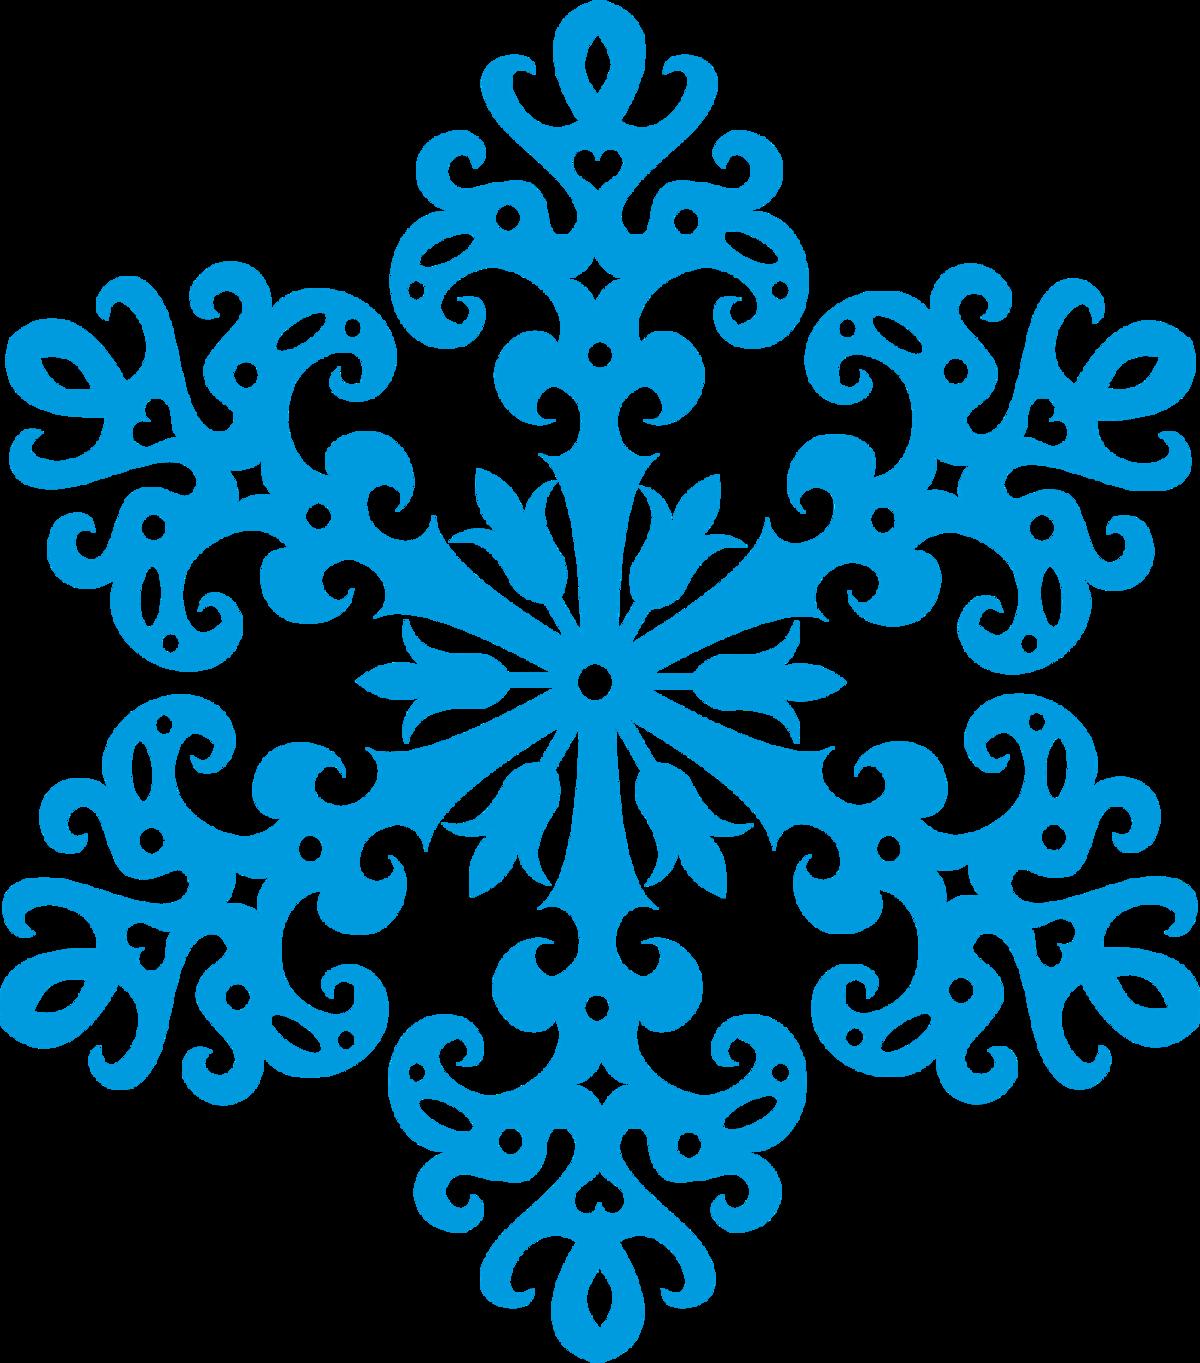 Снежинка рисунок без фона